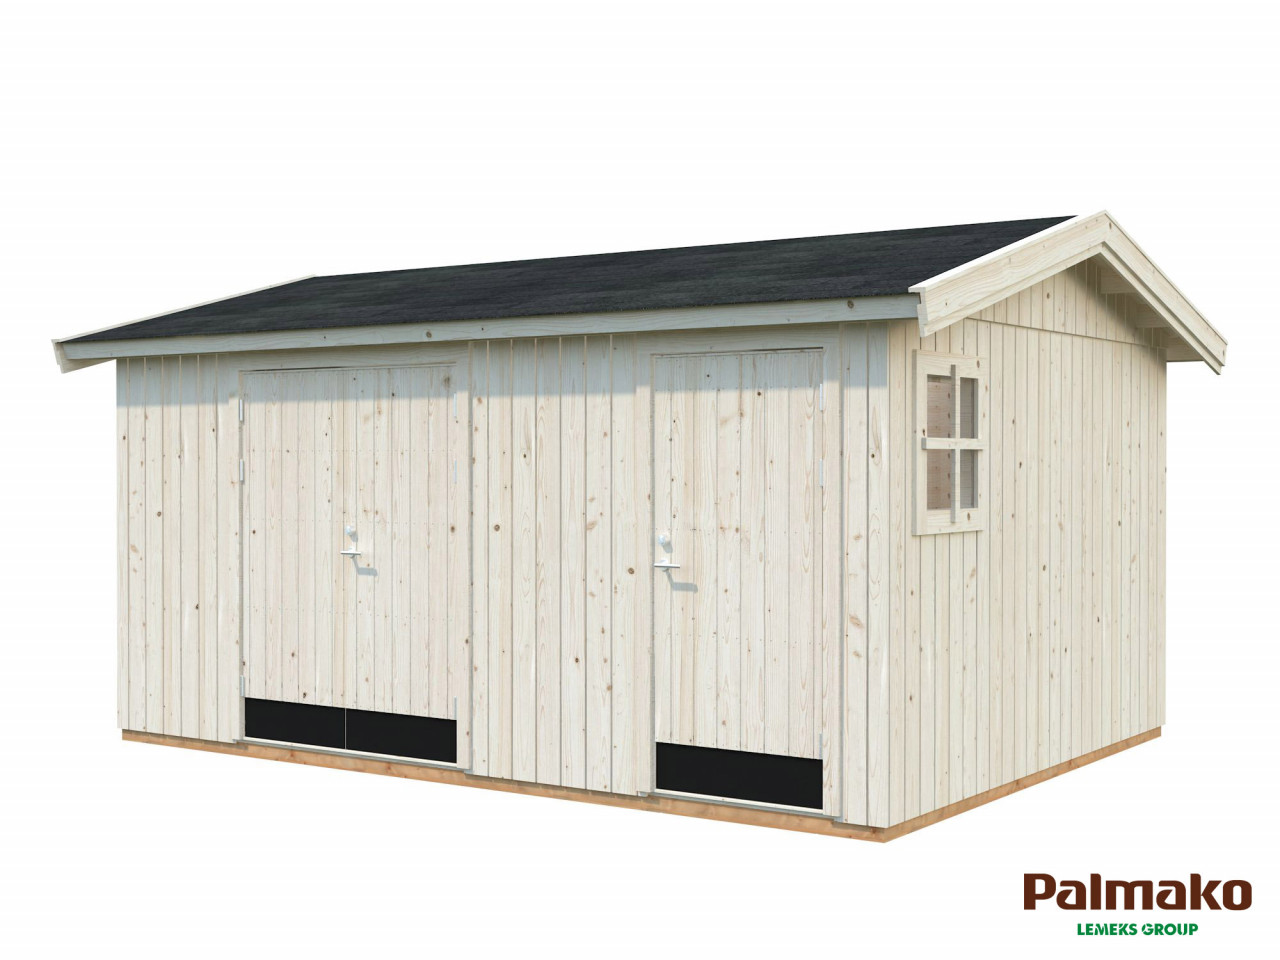 Palmako Gerätehaus Olaf 13,5 m²